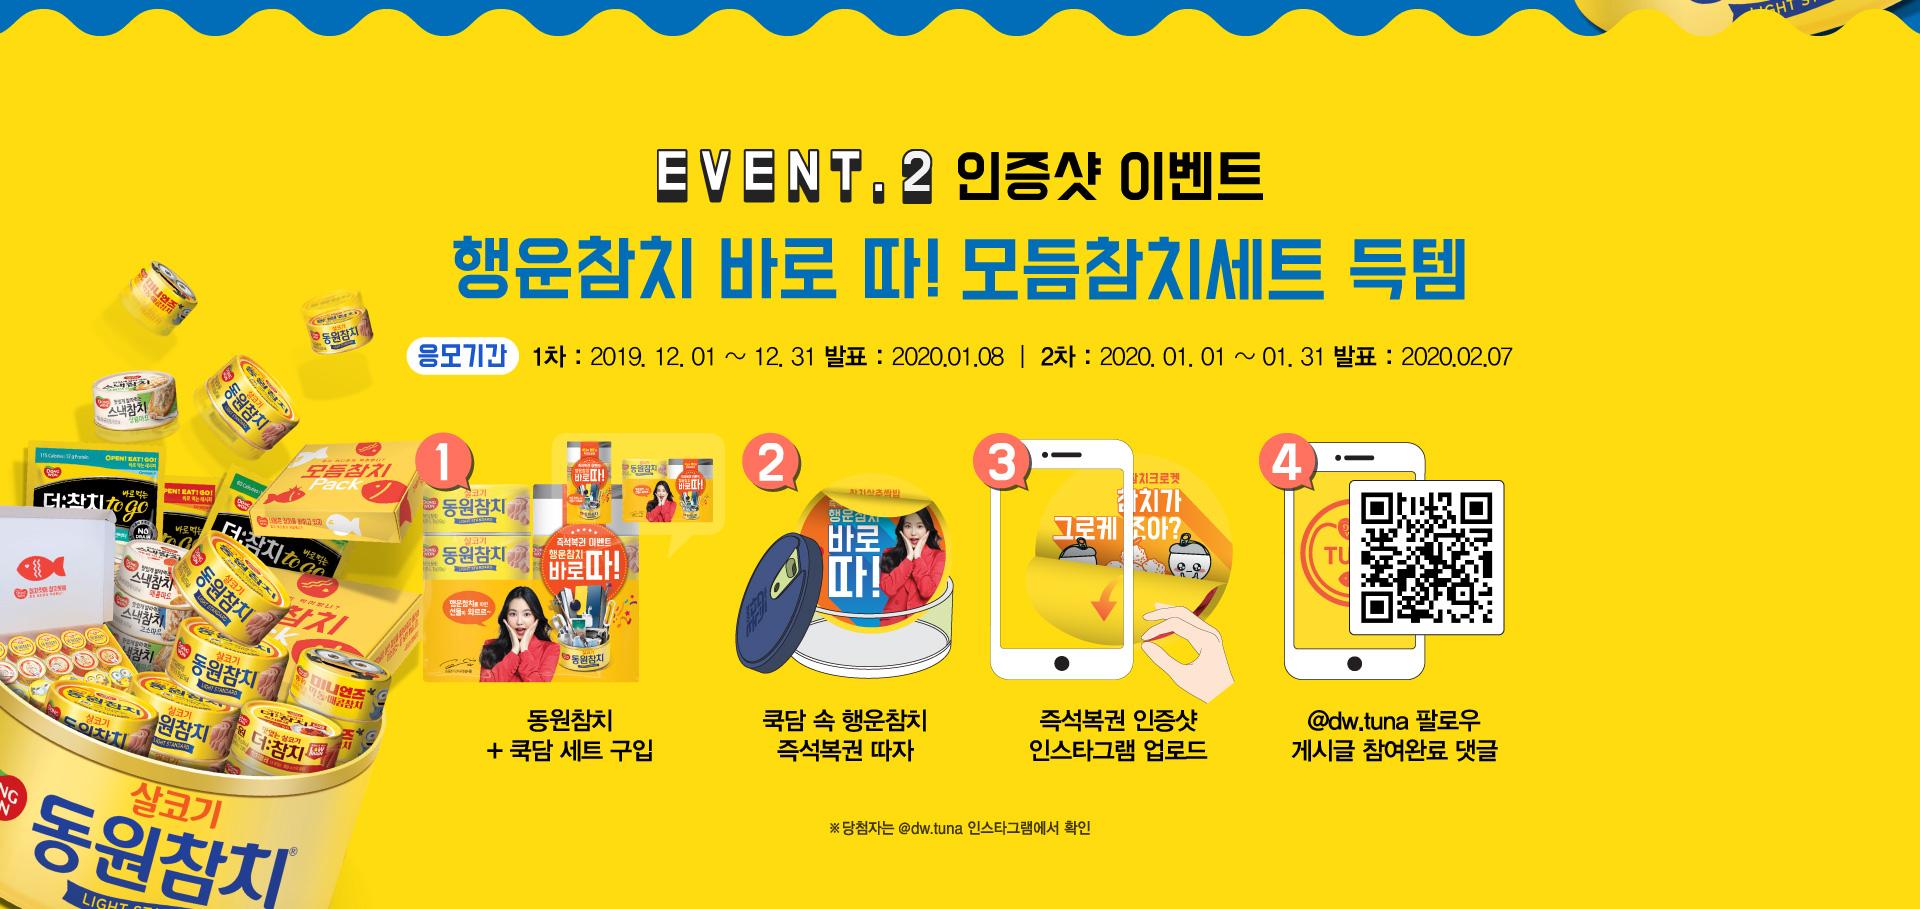 event 2 인증샷 이벤트 행운참치 바로 따 모듬참치세트 득템